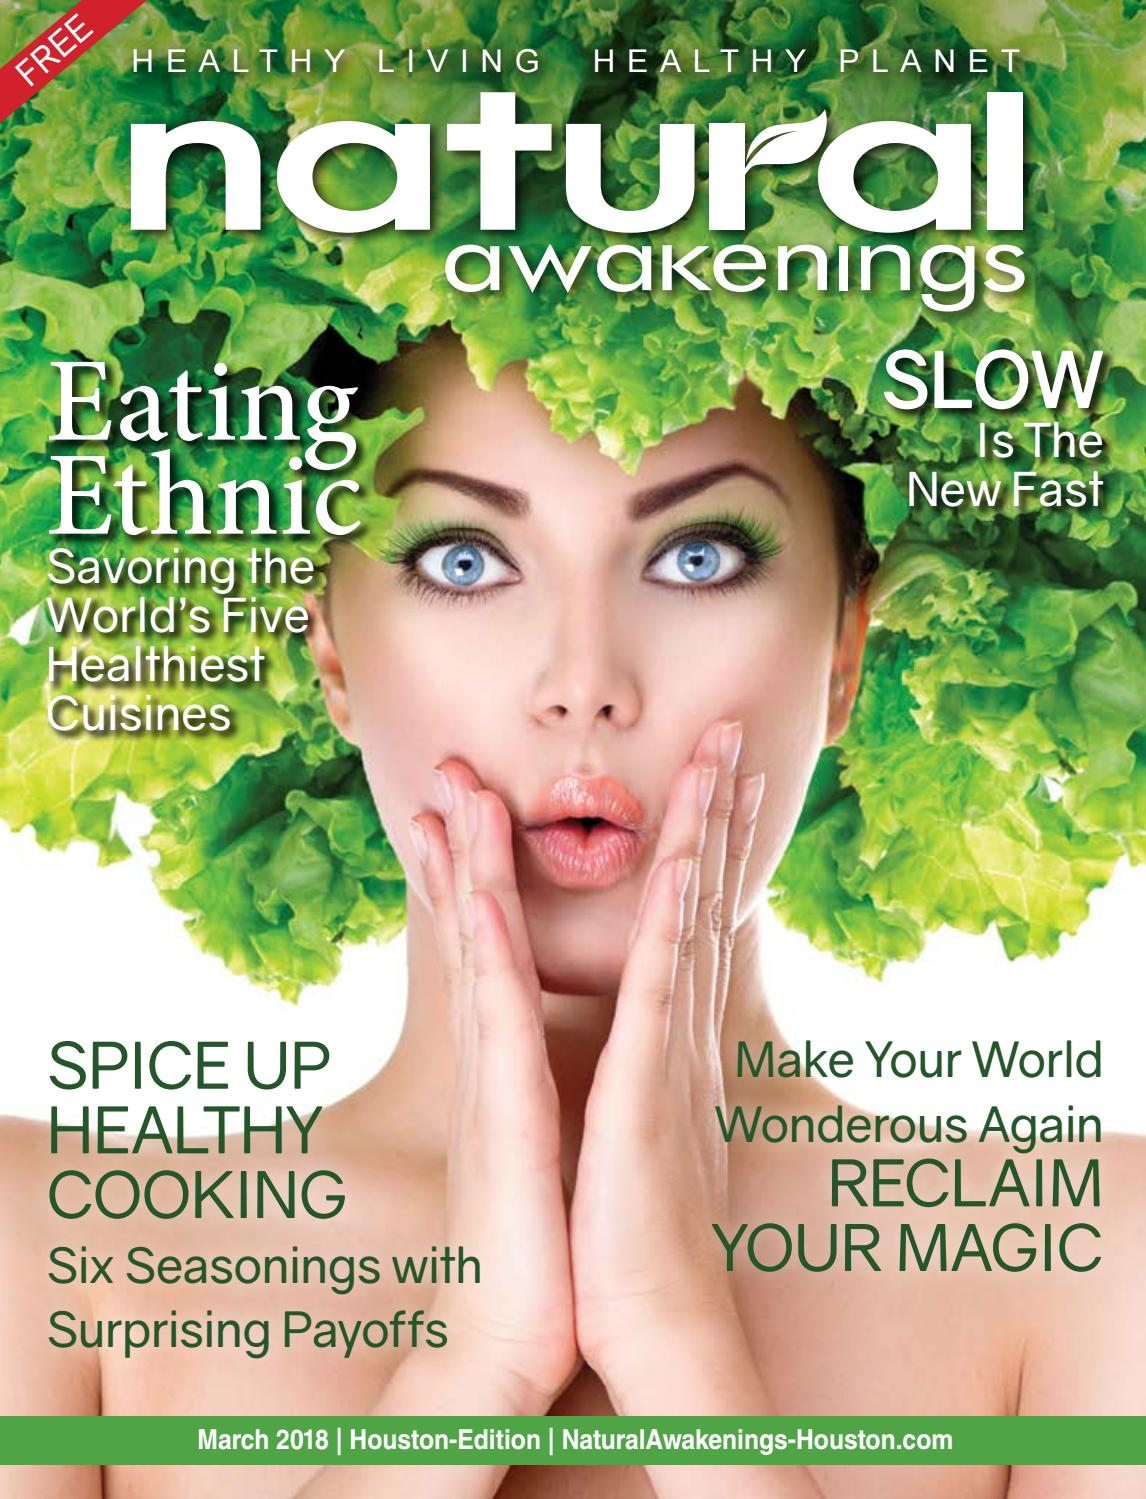 March 2018 by Holistic Choice Publishing/Natural Awakenings Houston